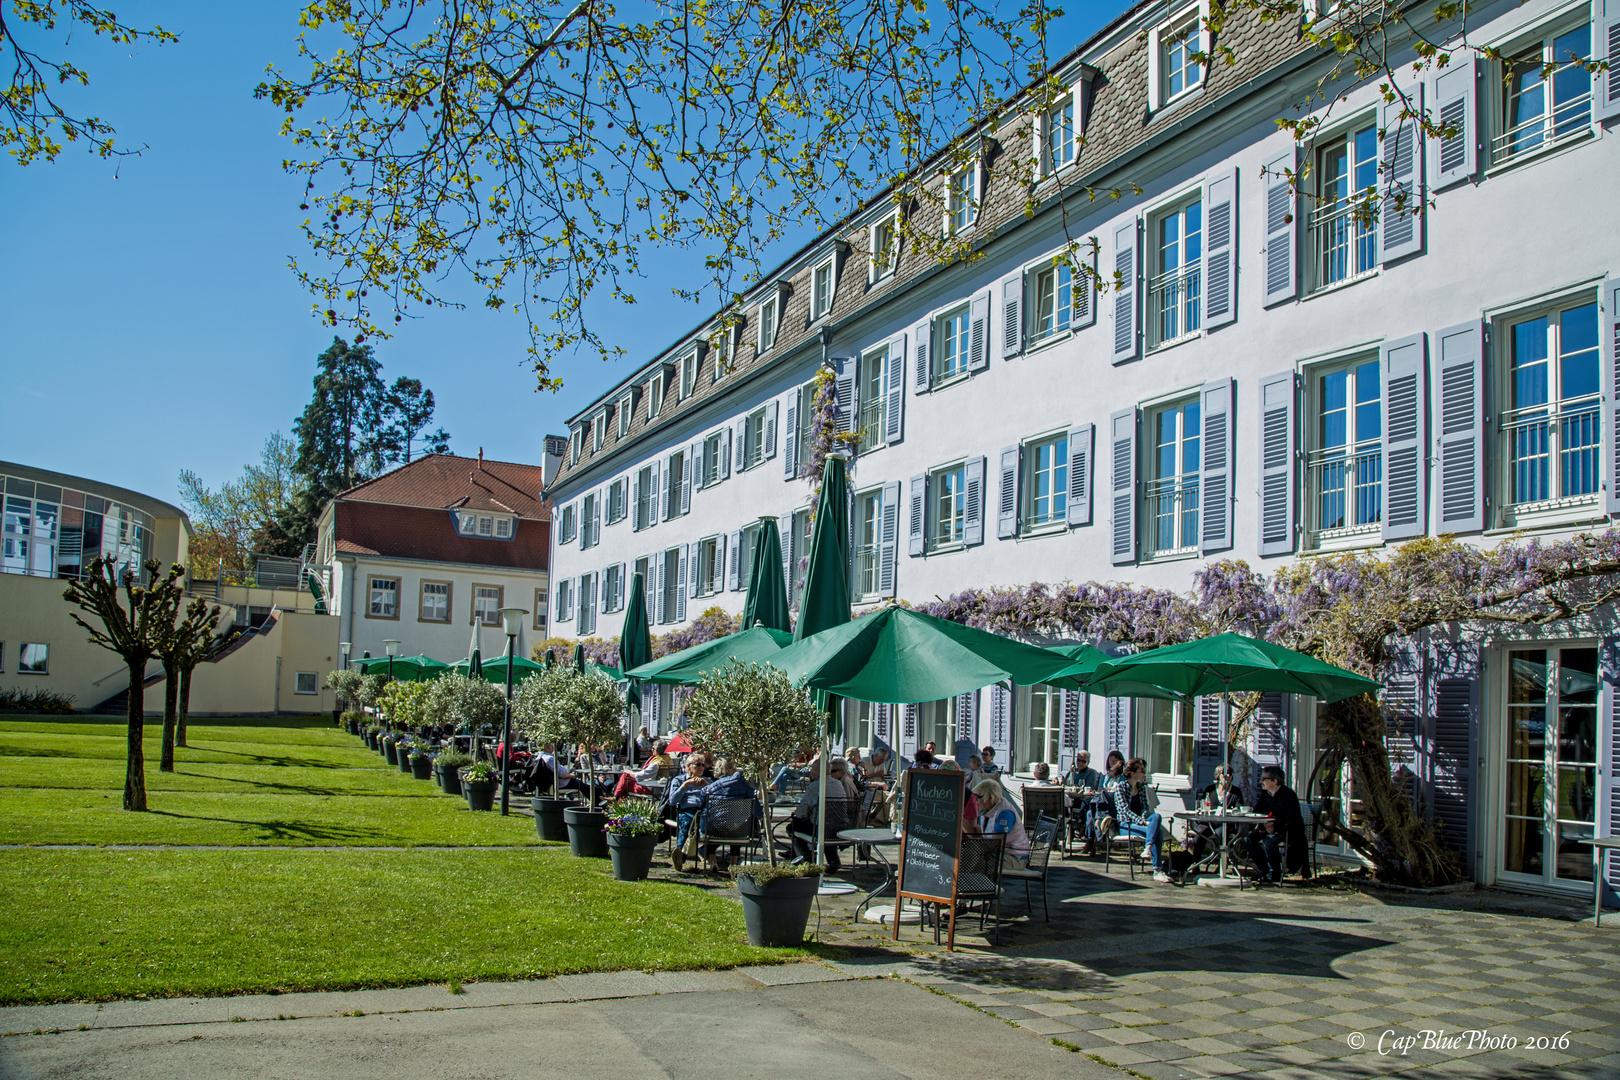 Bad Hotel Überlingen